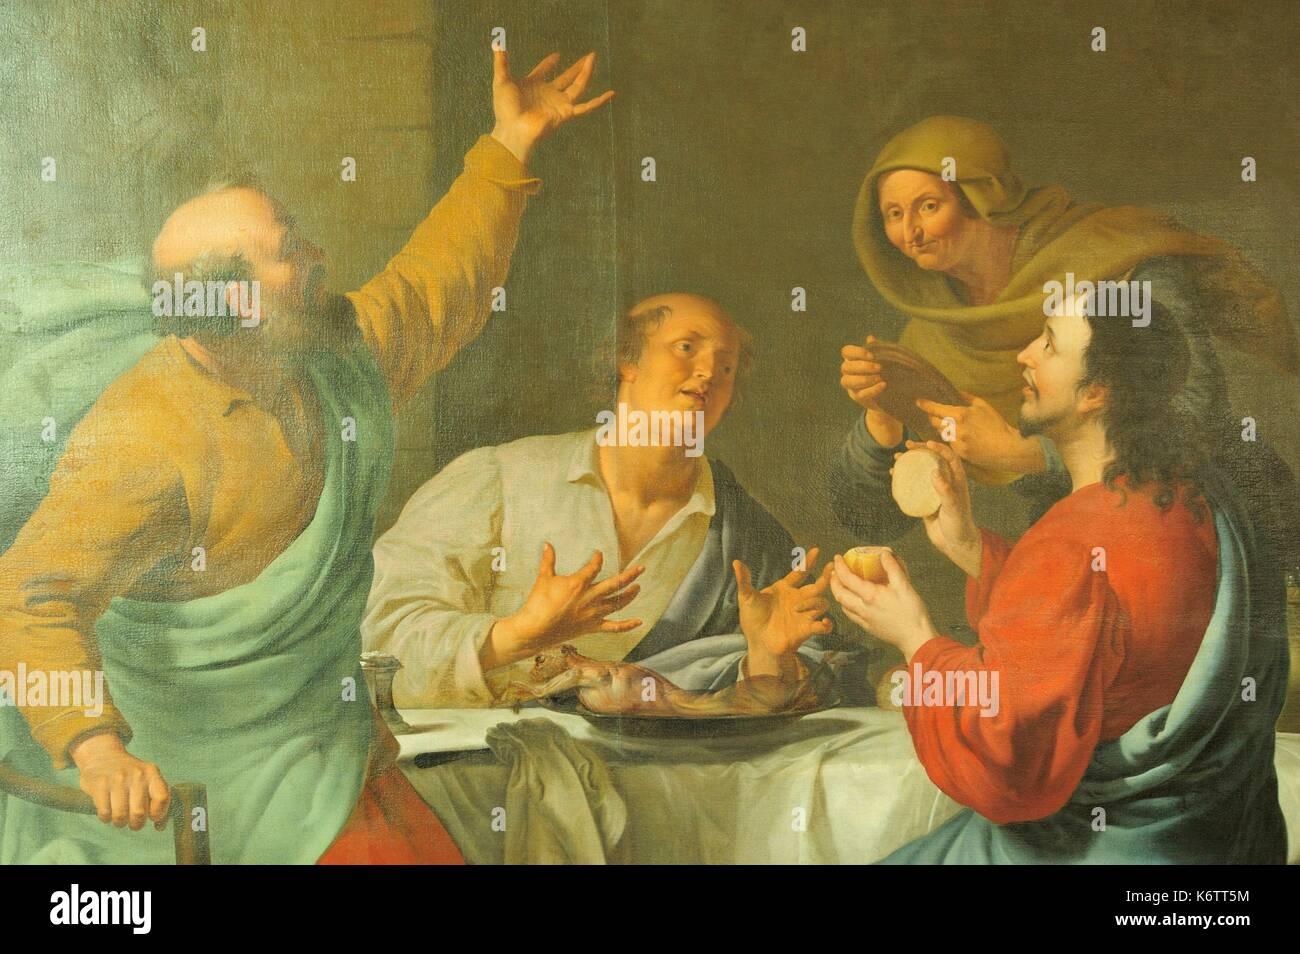 Francia, Nord, Saint Amand les Eaux, museo della Torre Abbey, pittura ad olio su tela intitolata i pellegrini di Emmaus da Aelbert Jansz Van der Schoor e dipinte in 1680 Immagini Stock